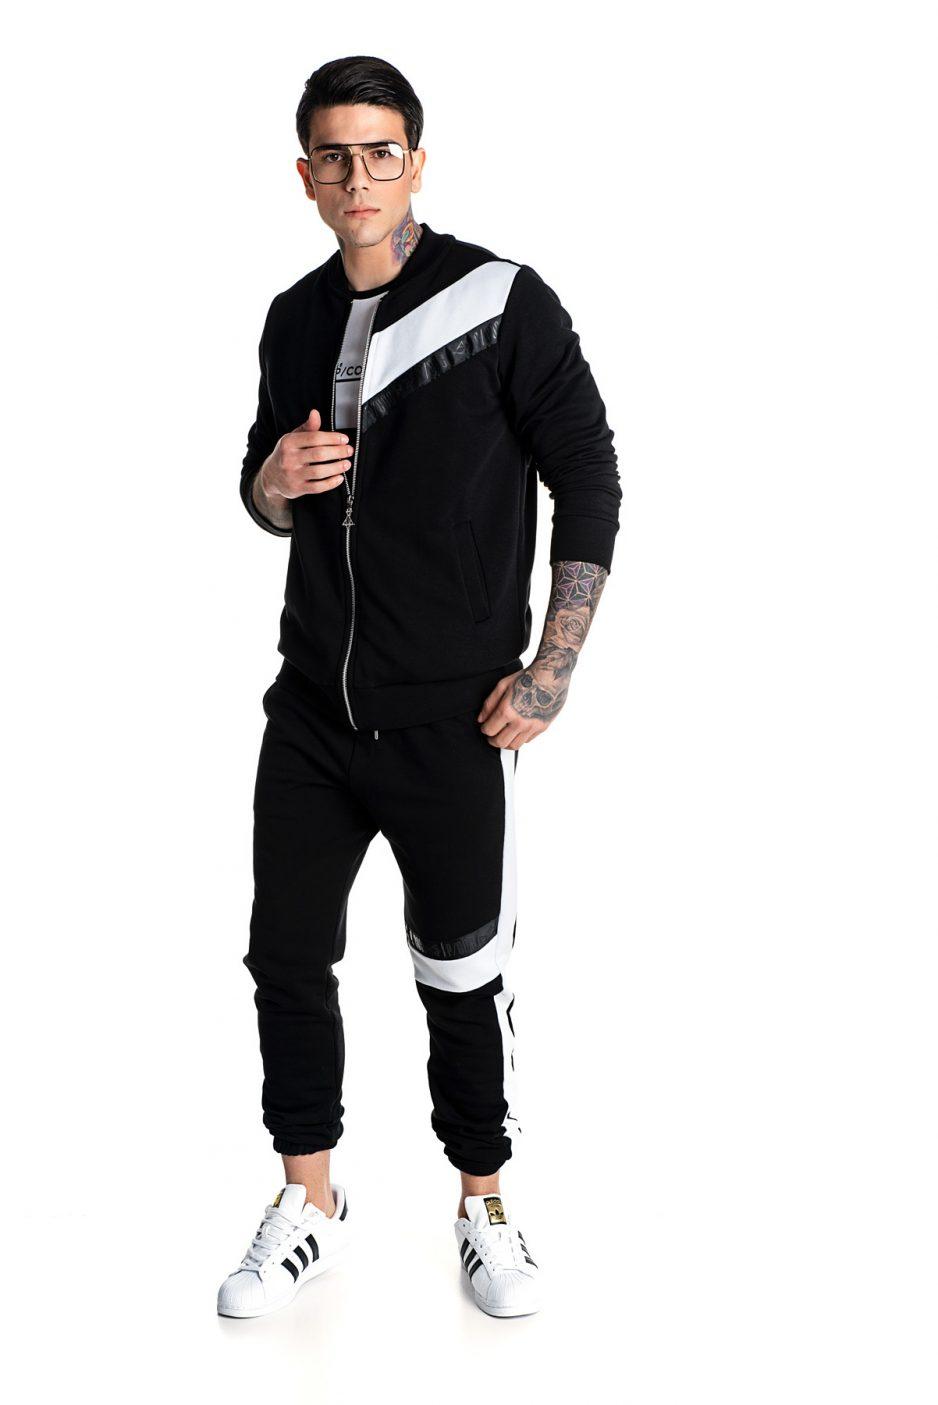 Black and white bomber jacket